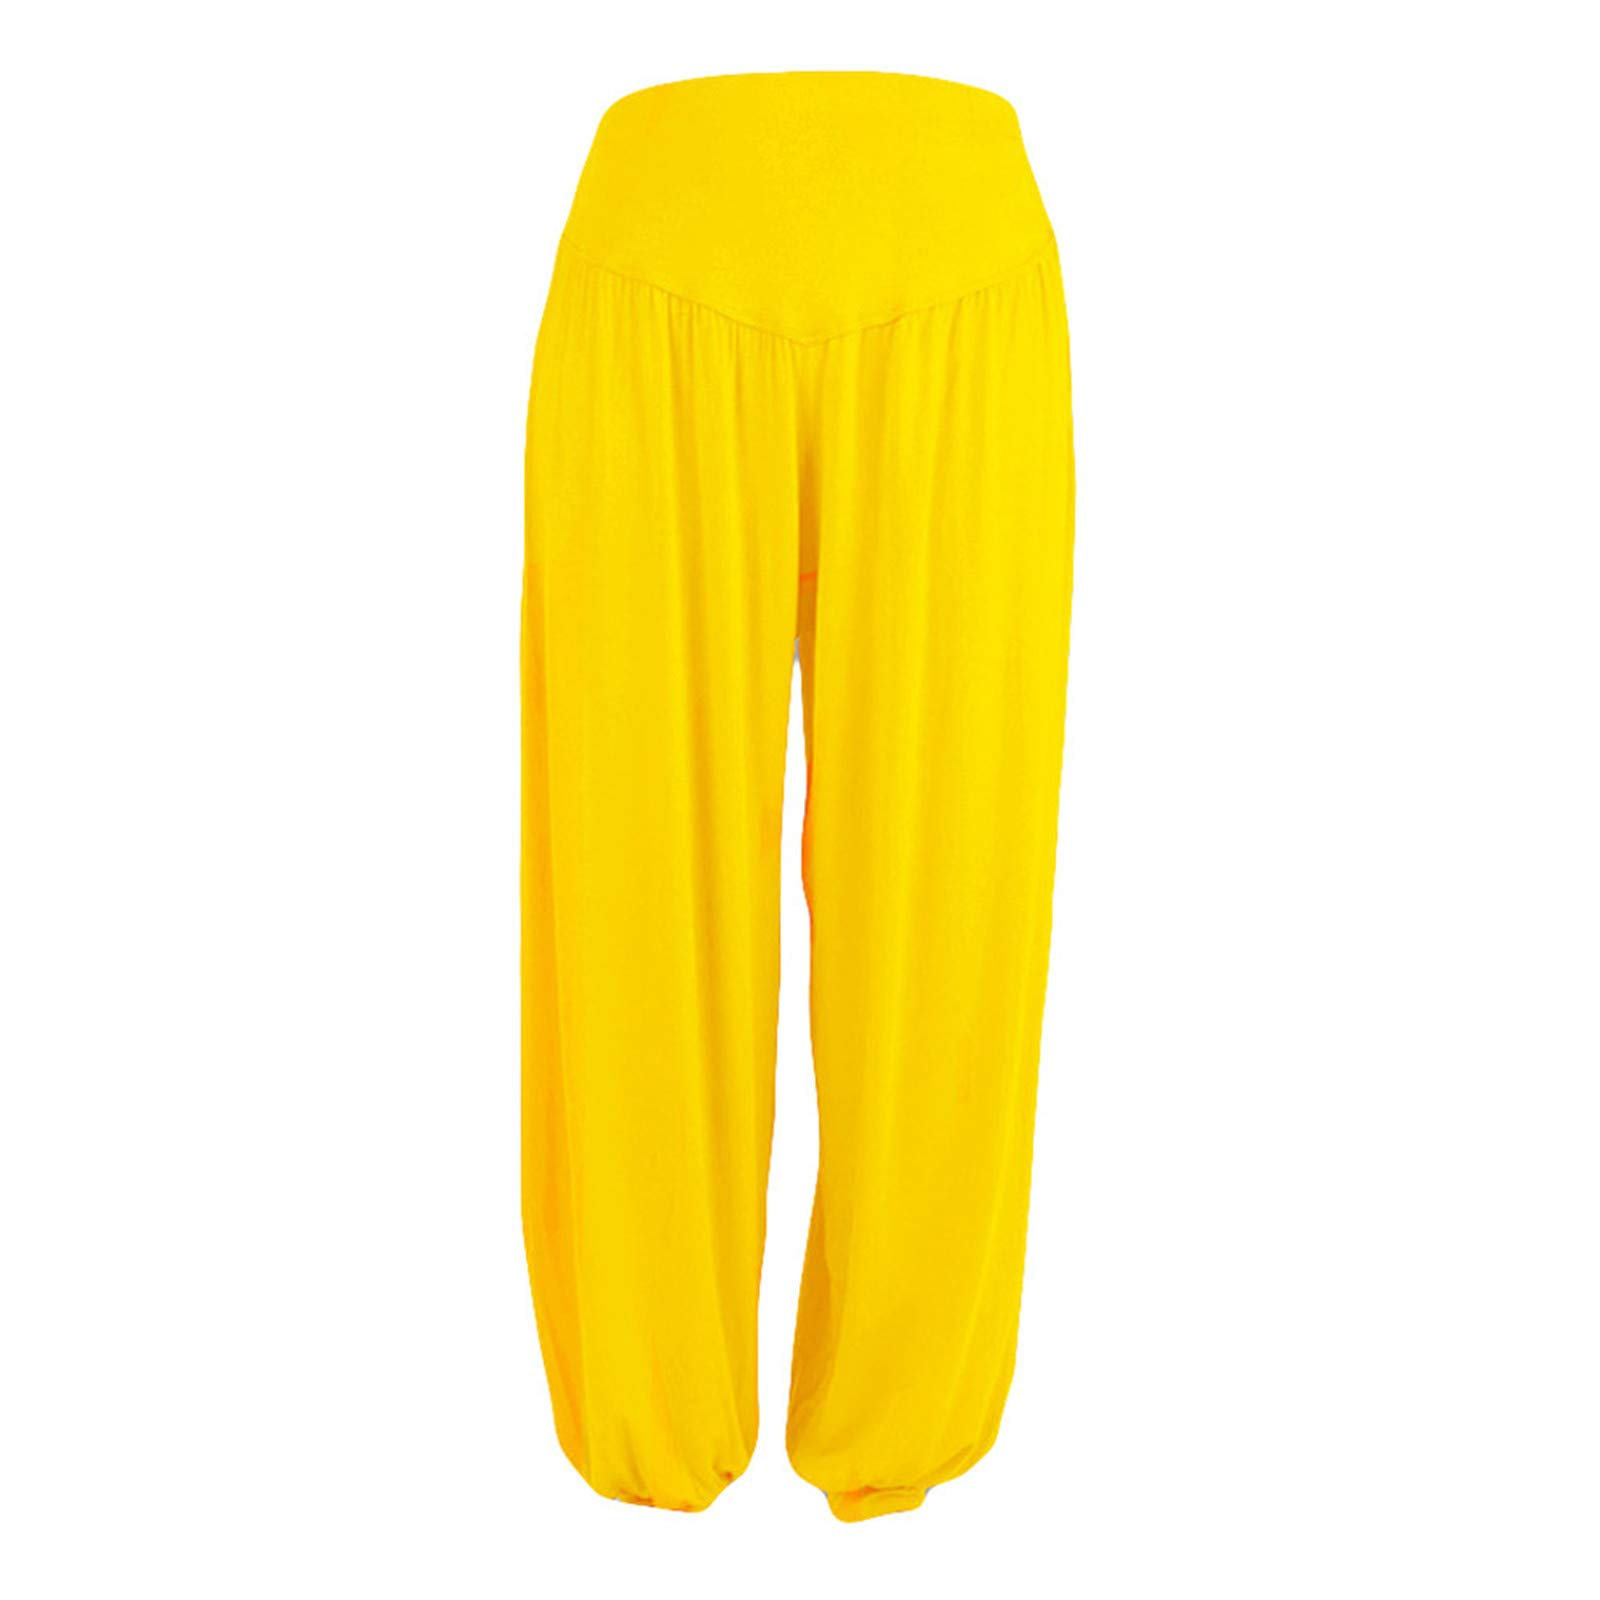 Thenxin Super Soft Cotton Harem Yoga Pilates Pants Elastic Waist Fitness Loose Fit Harem Trouser(Yellow,M)